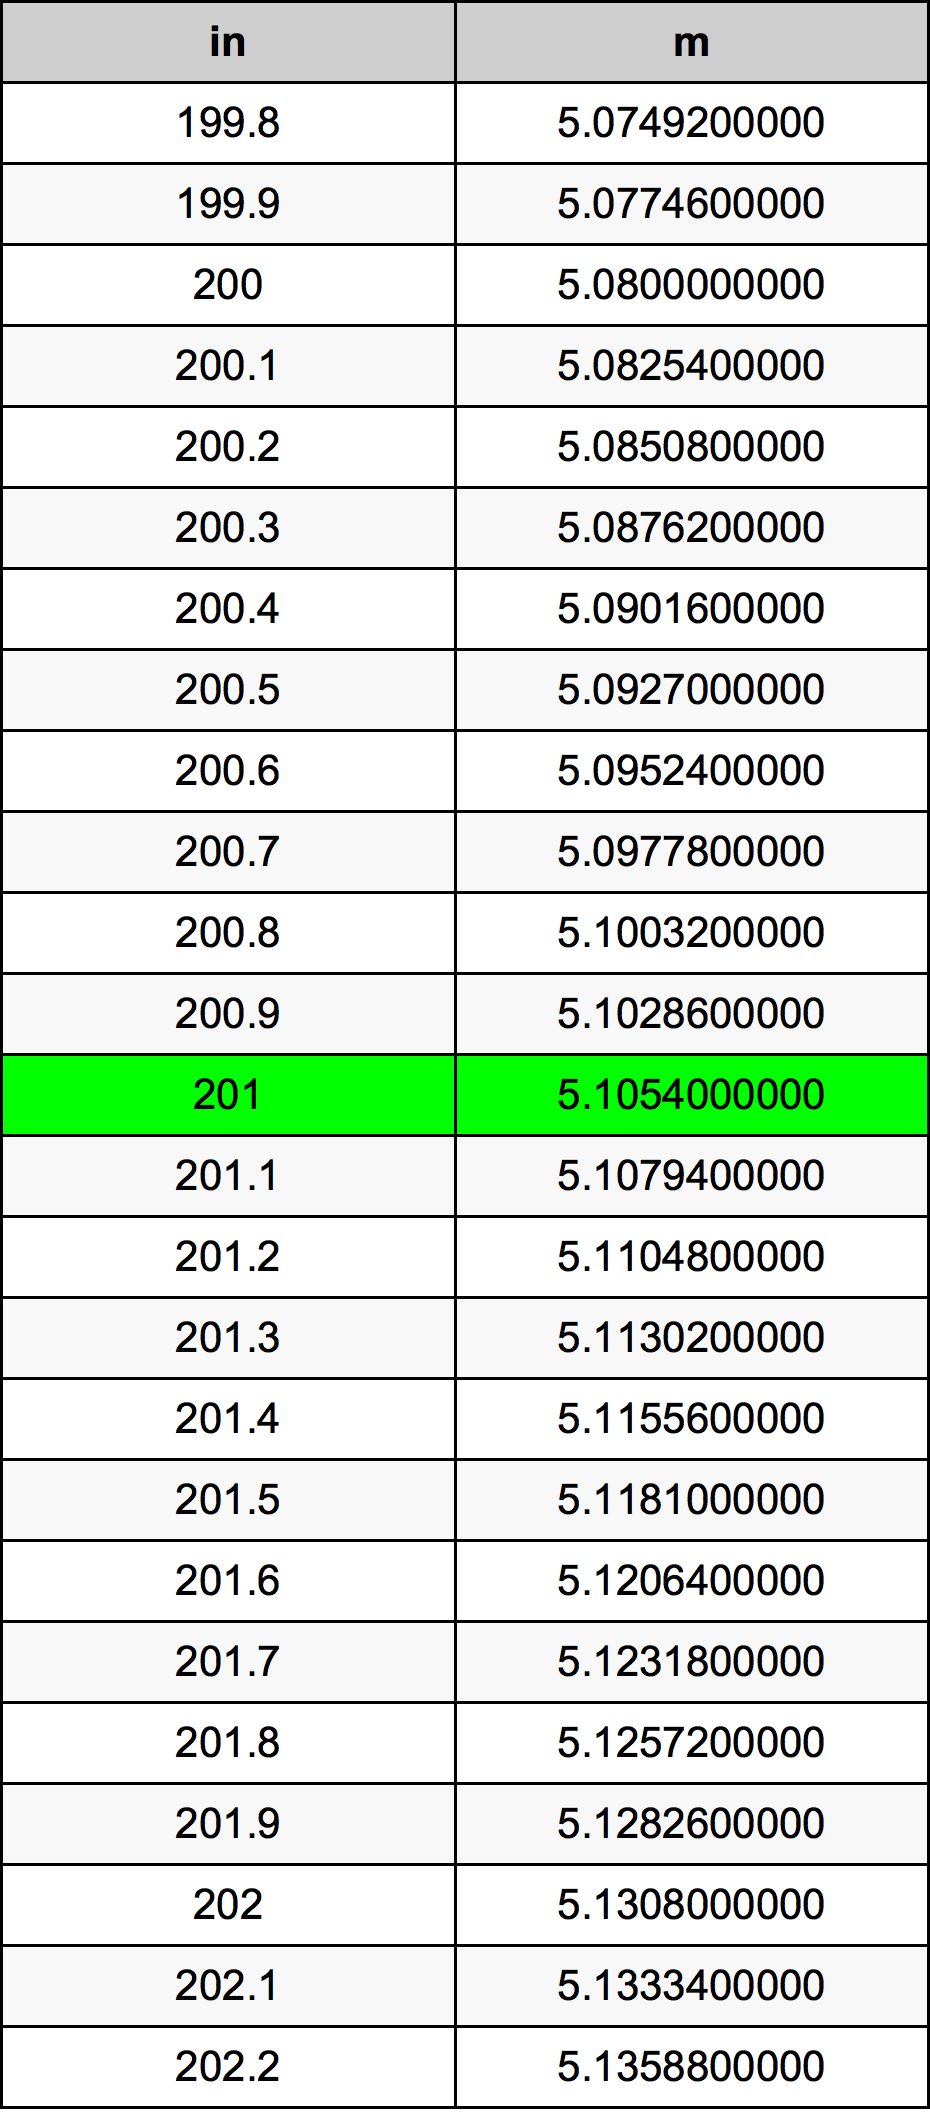 201 इंच रूपांतरण सारणी